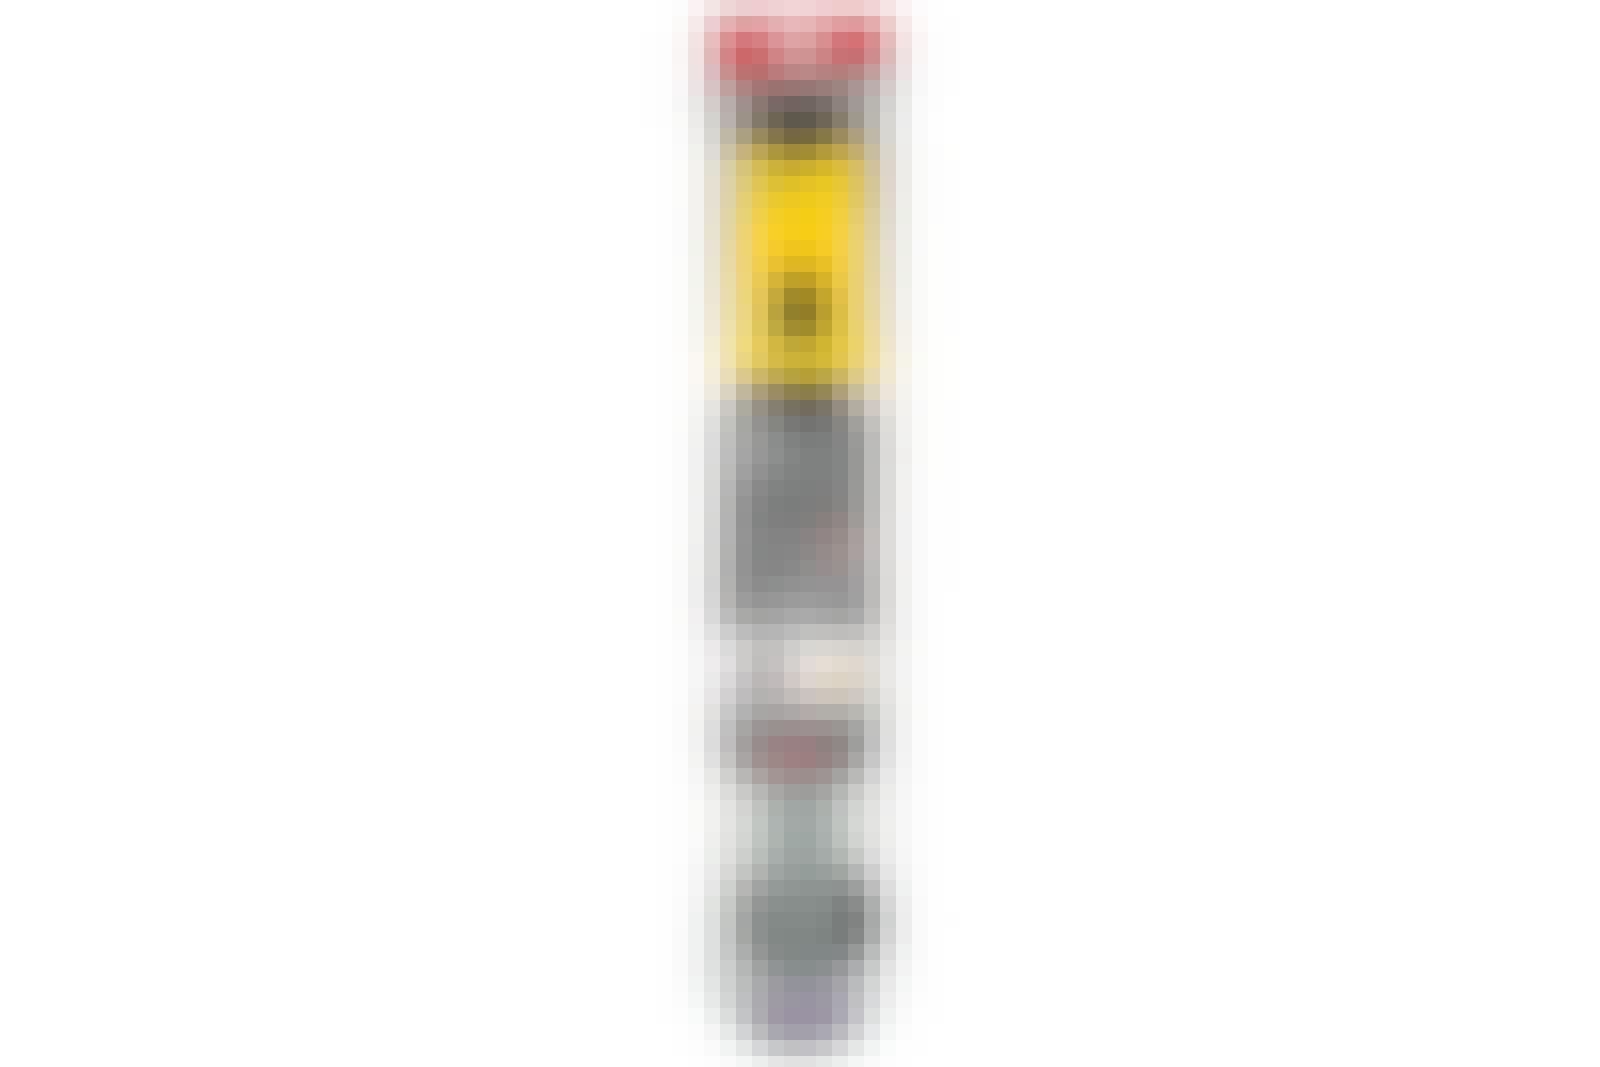 Knivskarp motorsav på 5 minutter: Det komplette startsæt